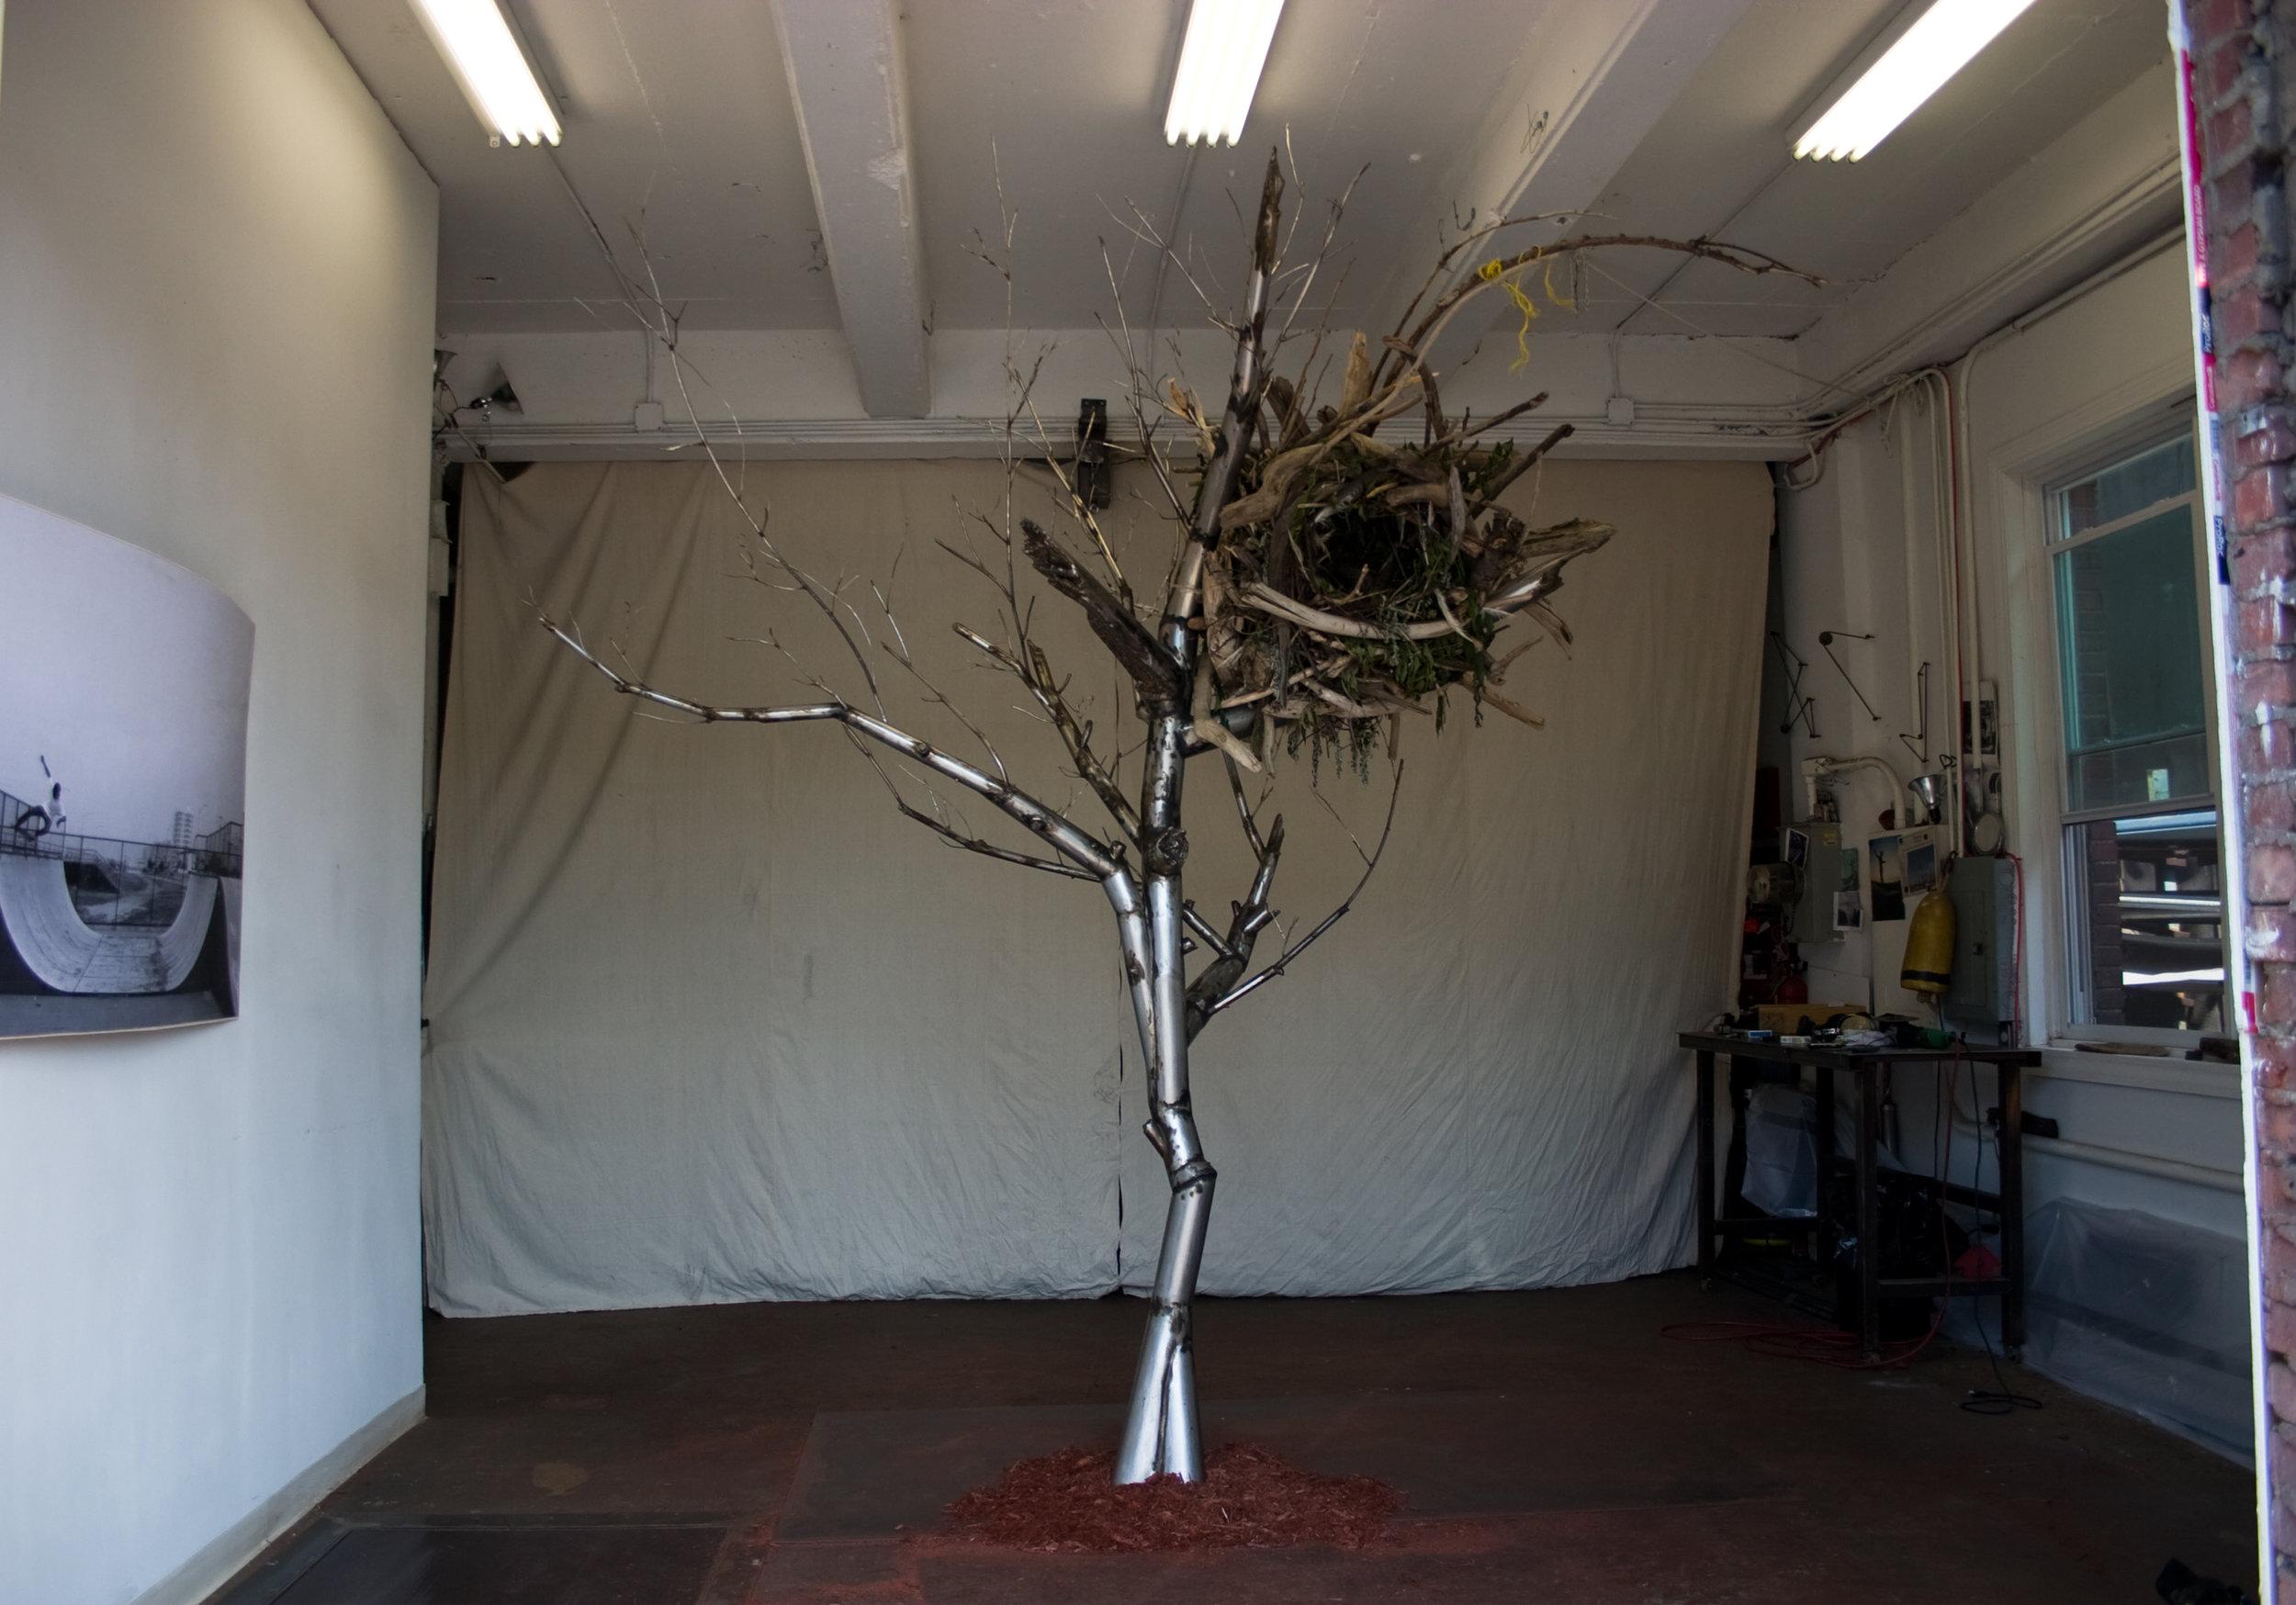 brandon d'leo artist new york city sculptor